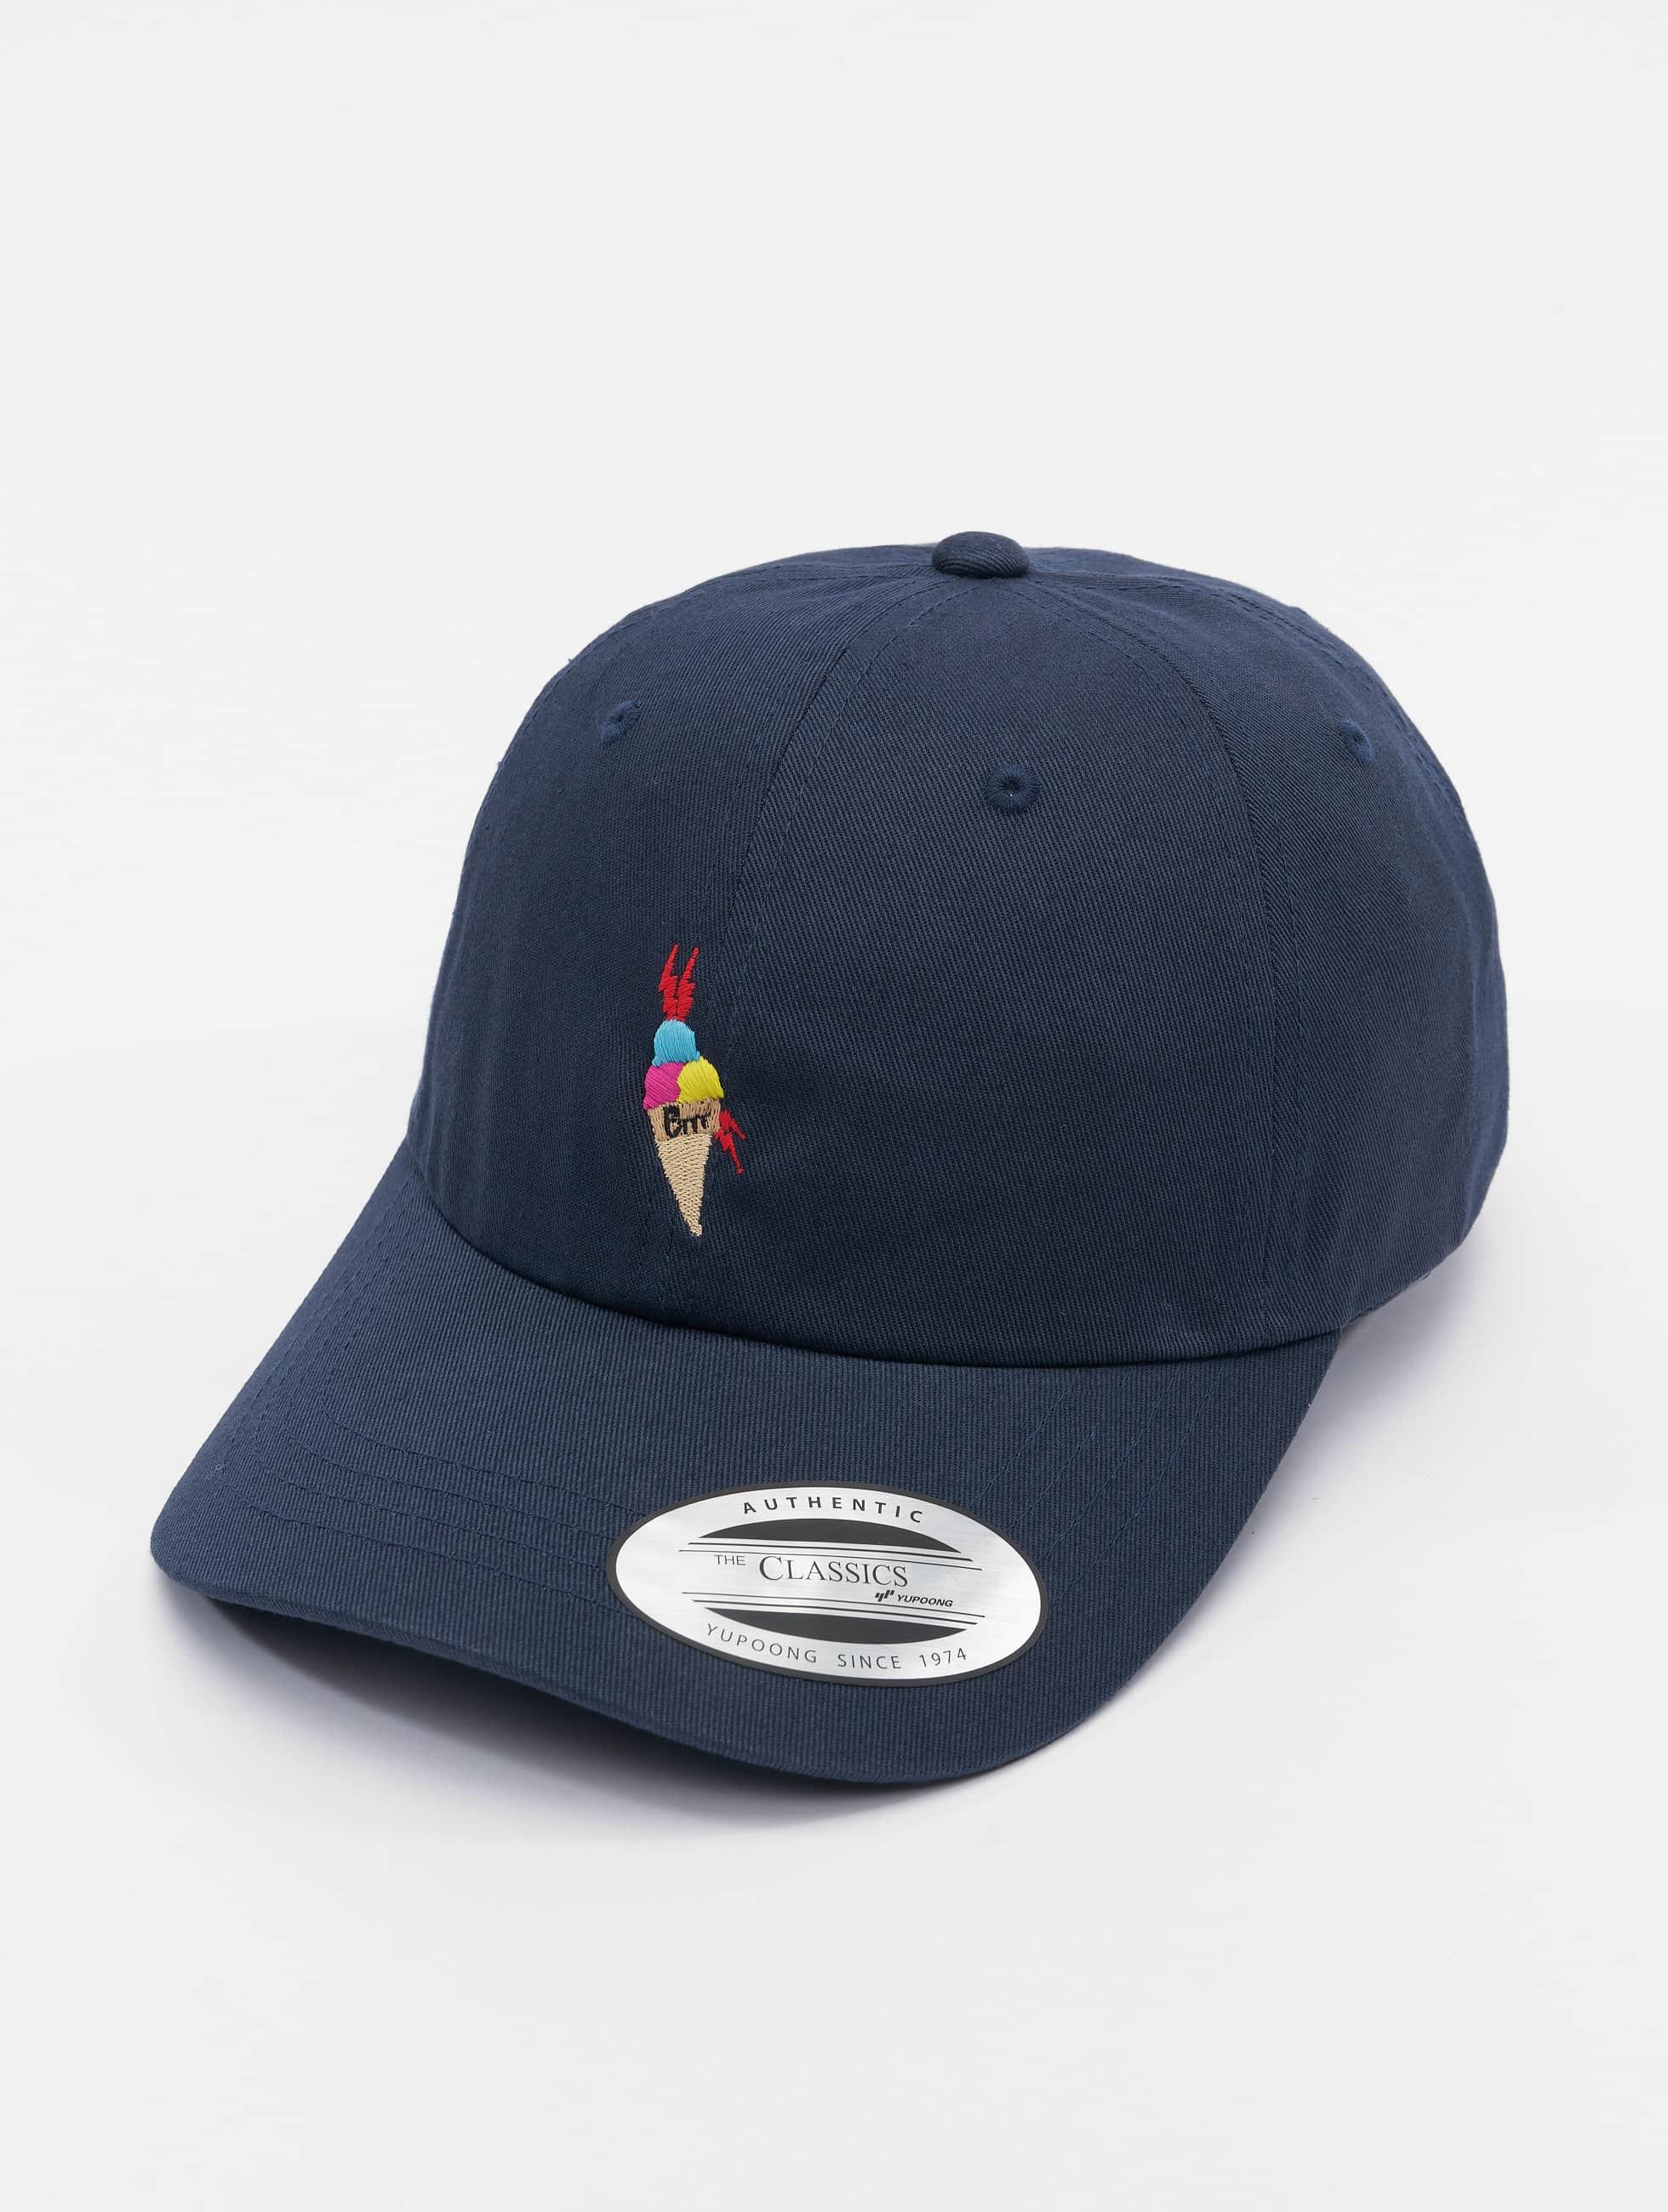 TurnUP Männer,Frauen Snapback Cap Brrr in blau